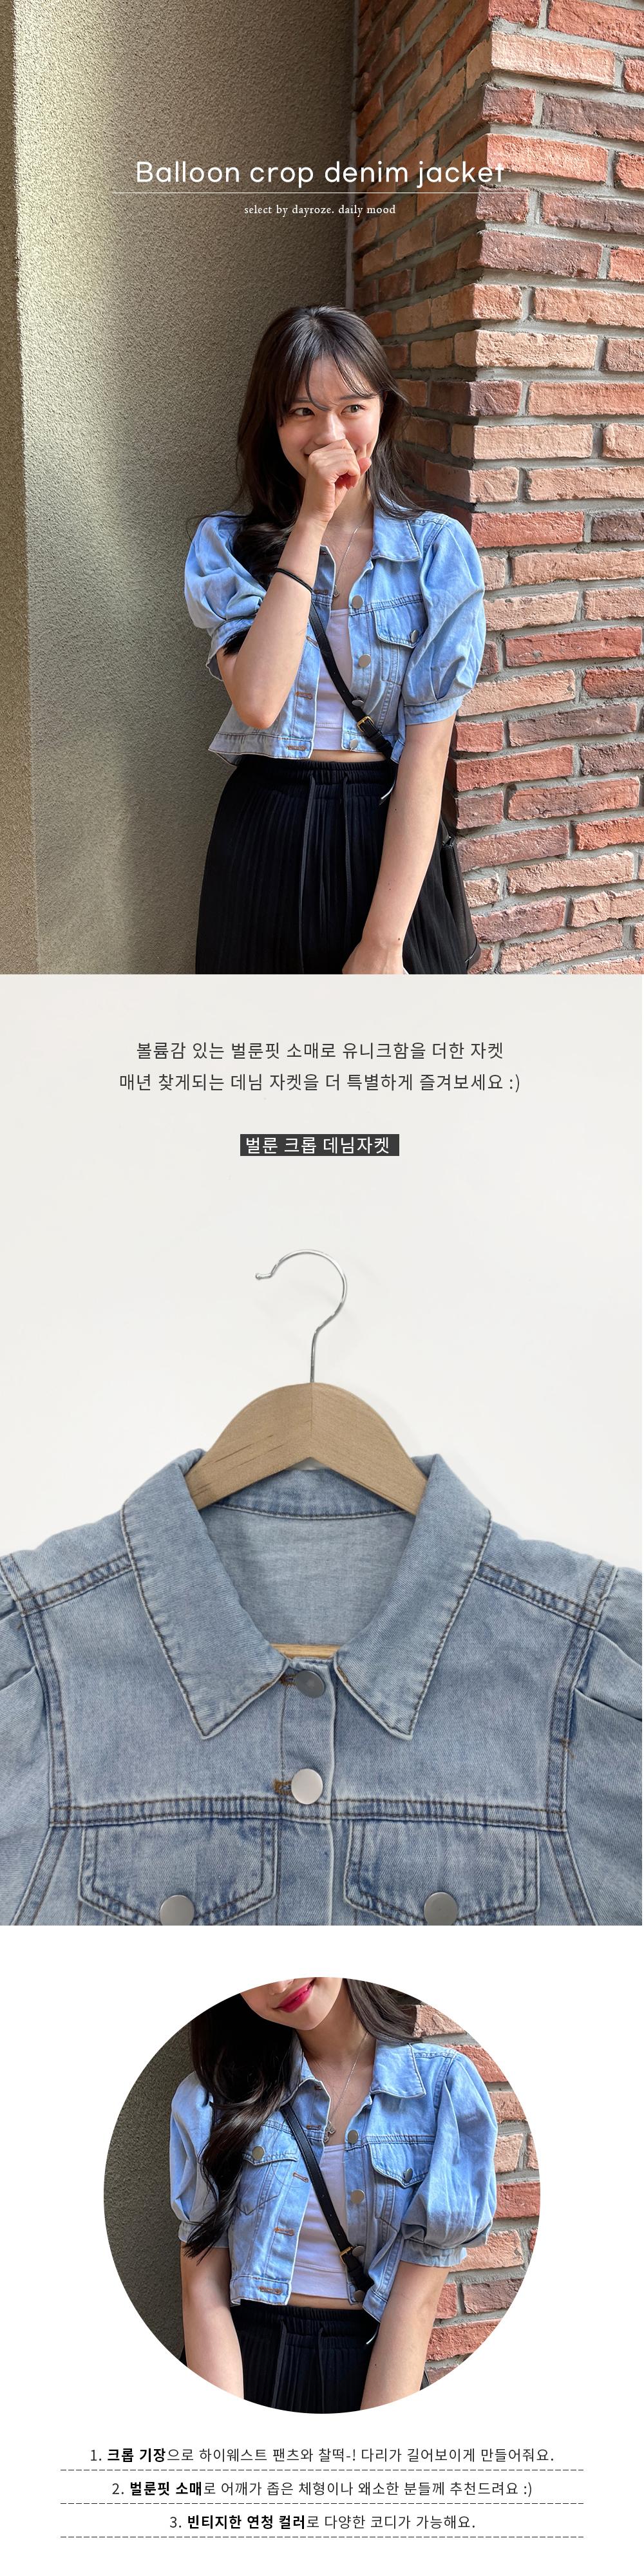 balloon cropped denim jacket